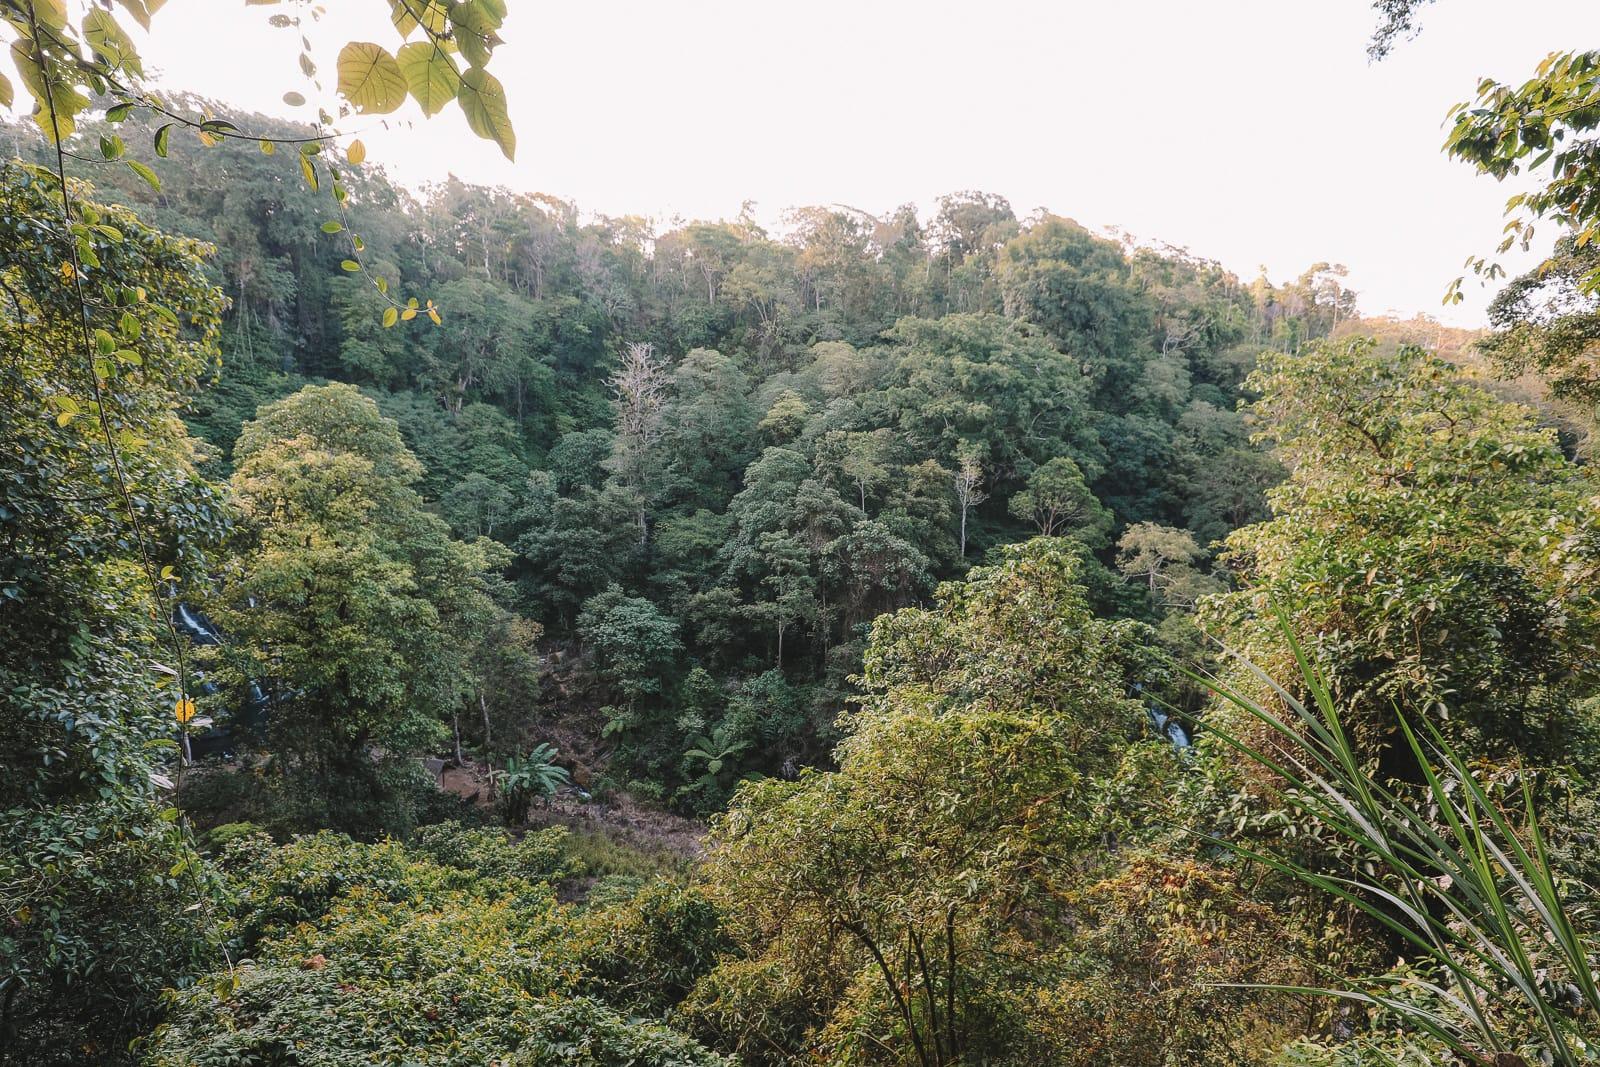 The Amazing Banyumala Twin Waterfalls In The Jungles Of Bali (8)